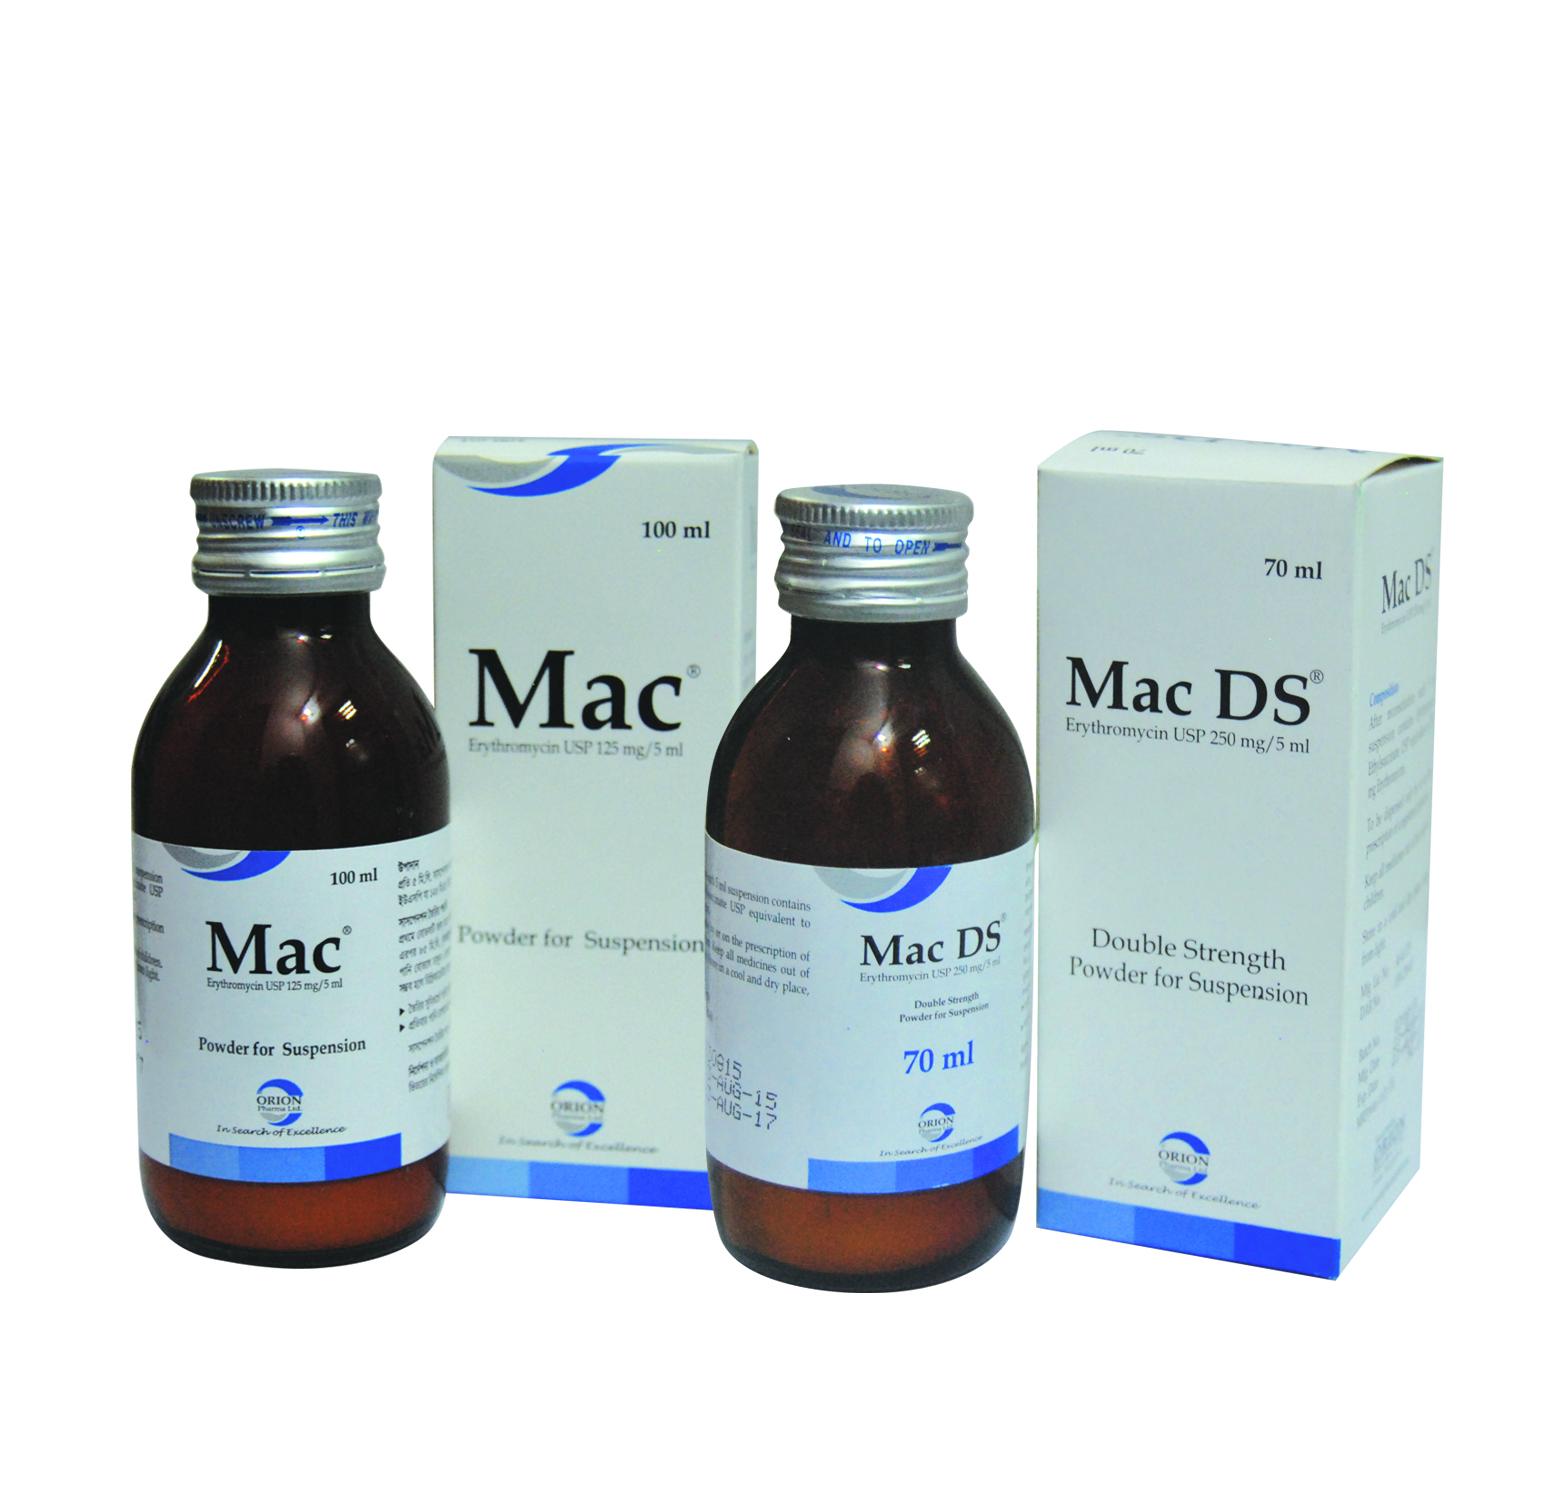 Erythromycin Ethylsuccinate Oral Suspension - Best